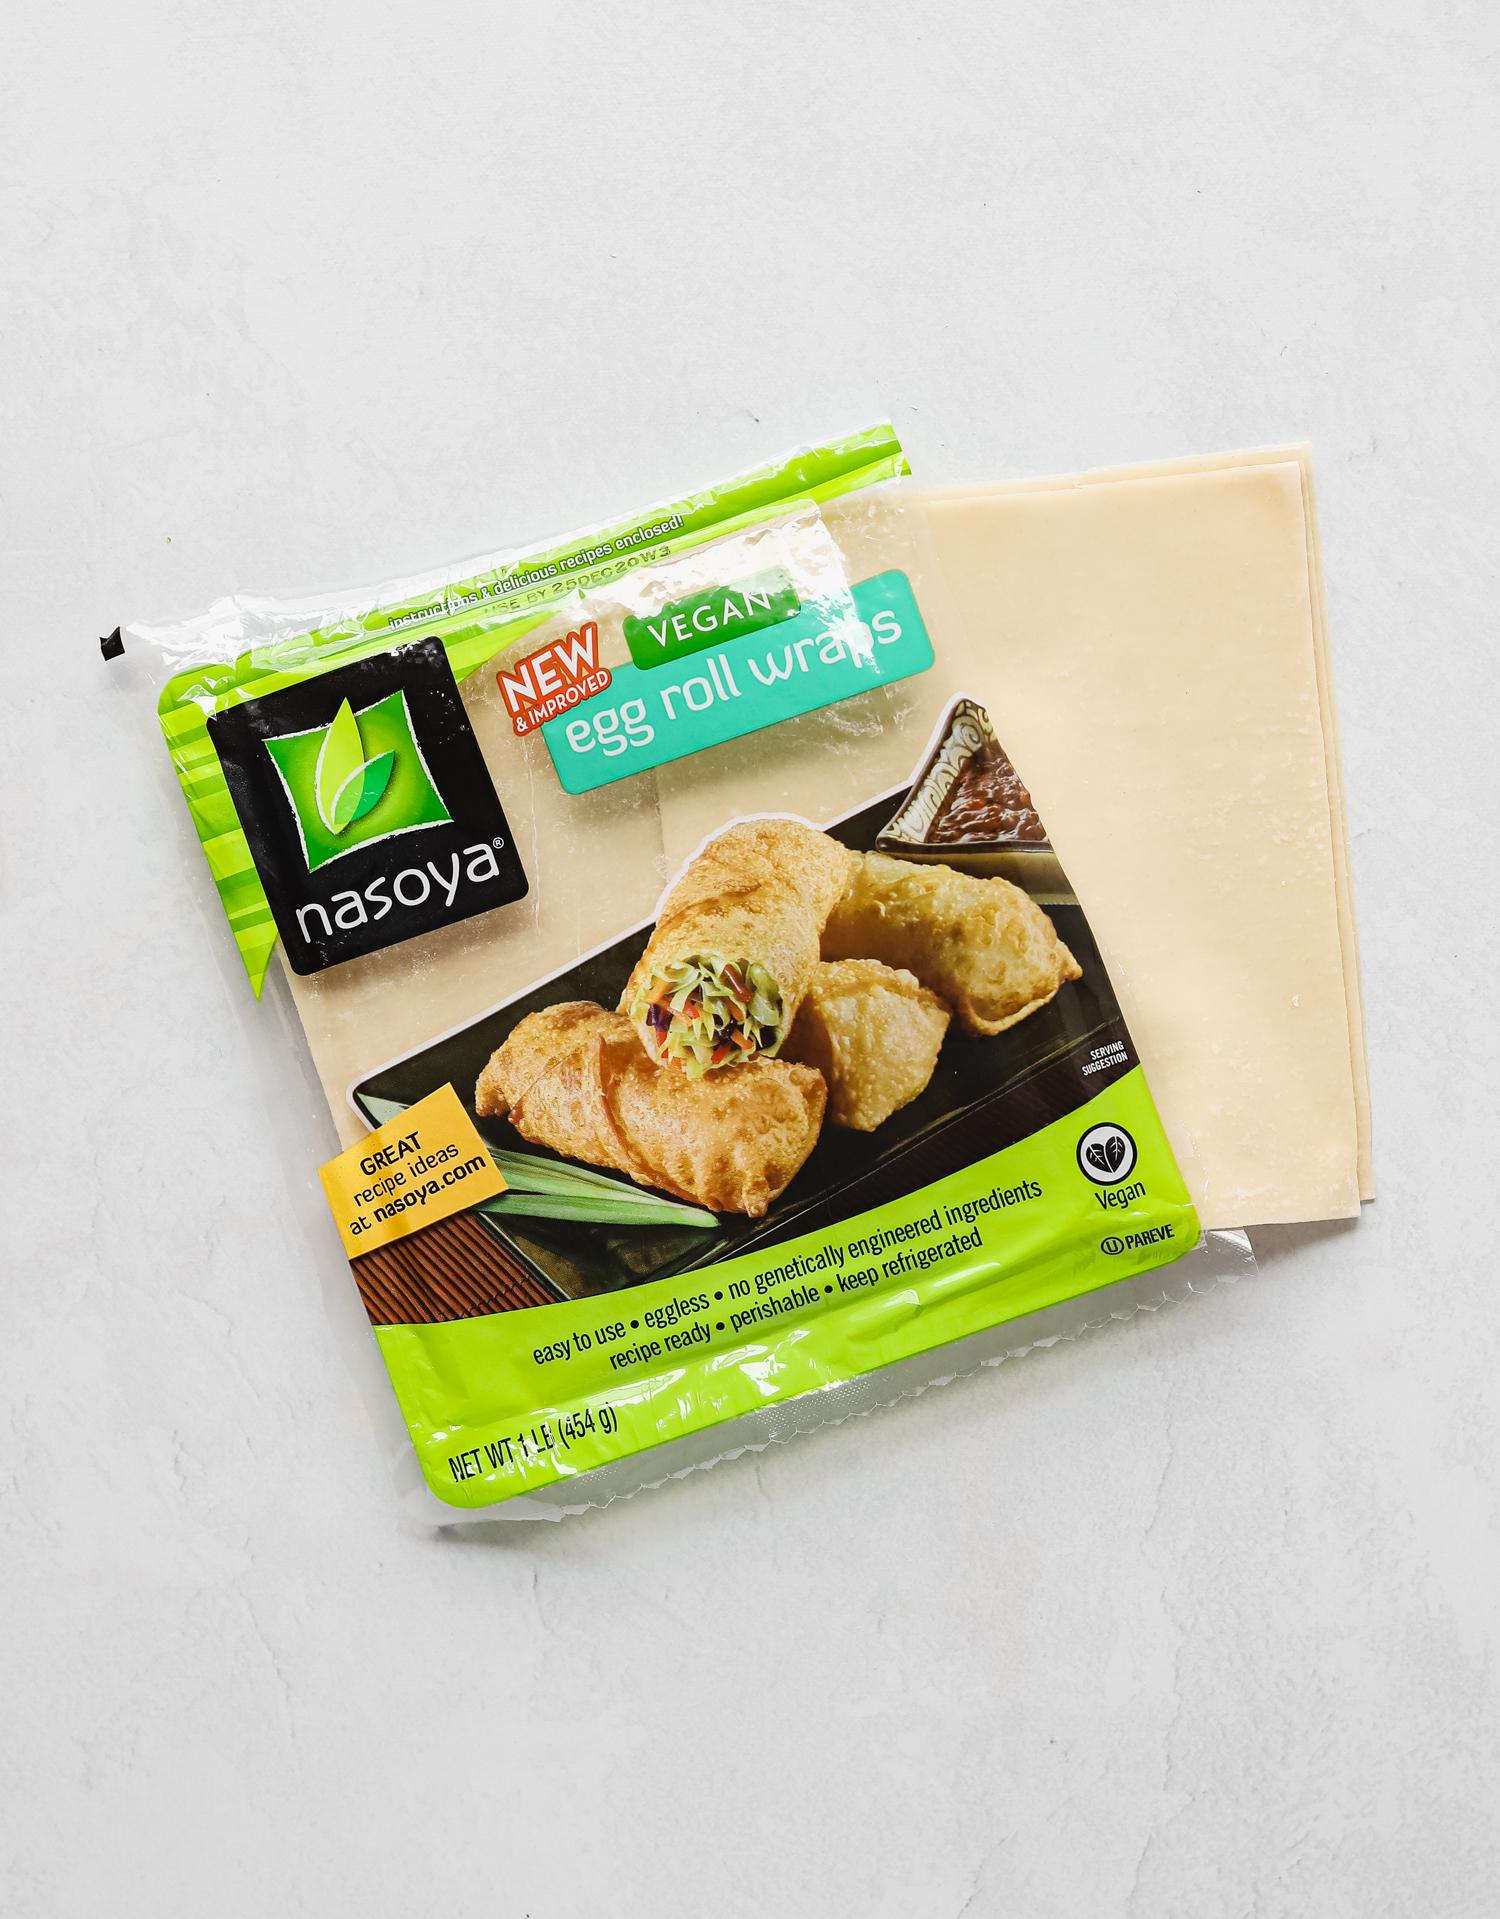 Nasoya vegan egg roll wrap package on a white table